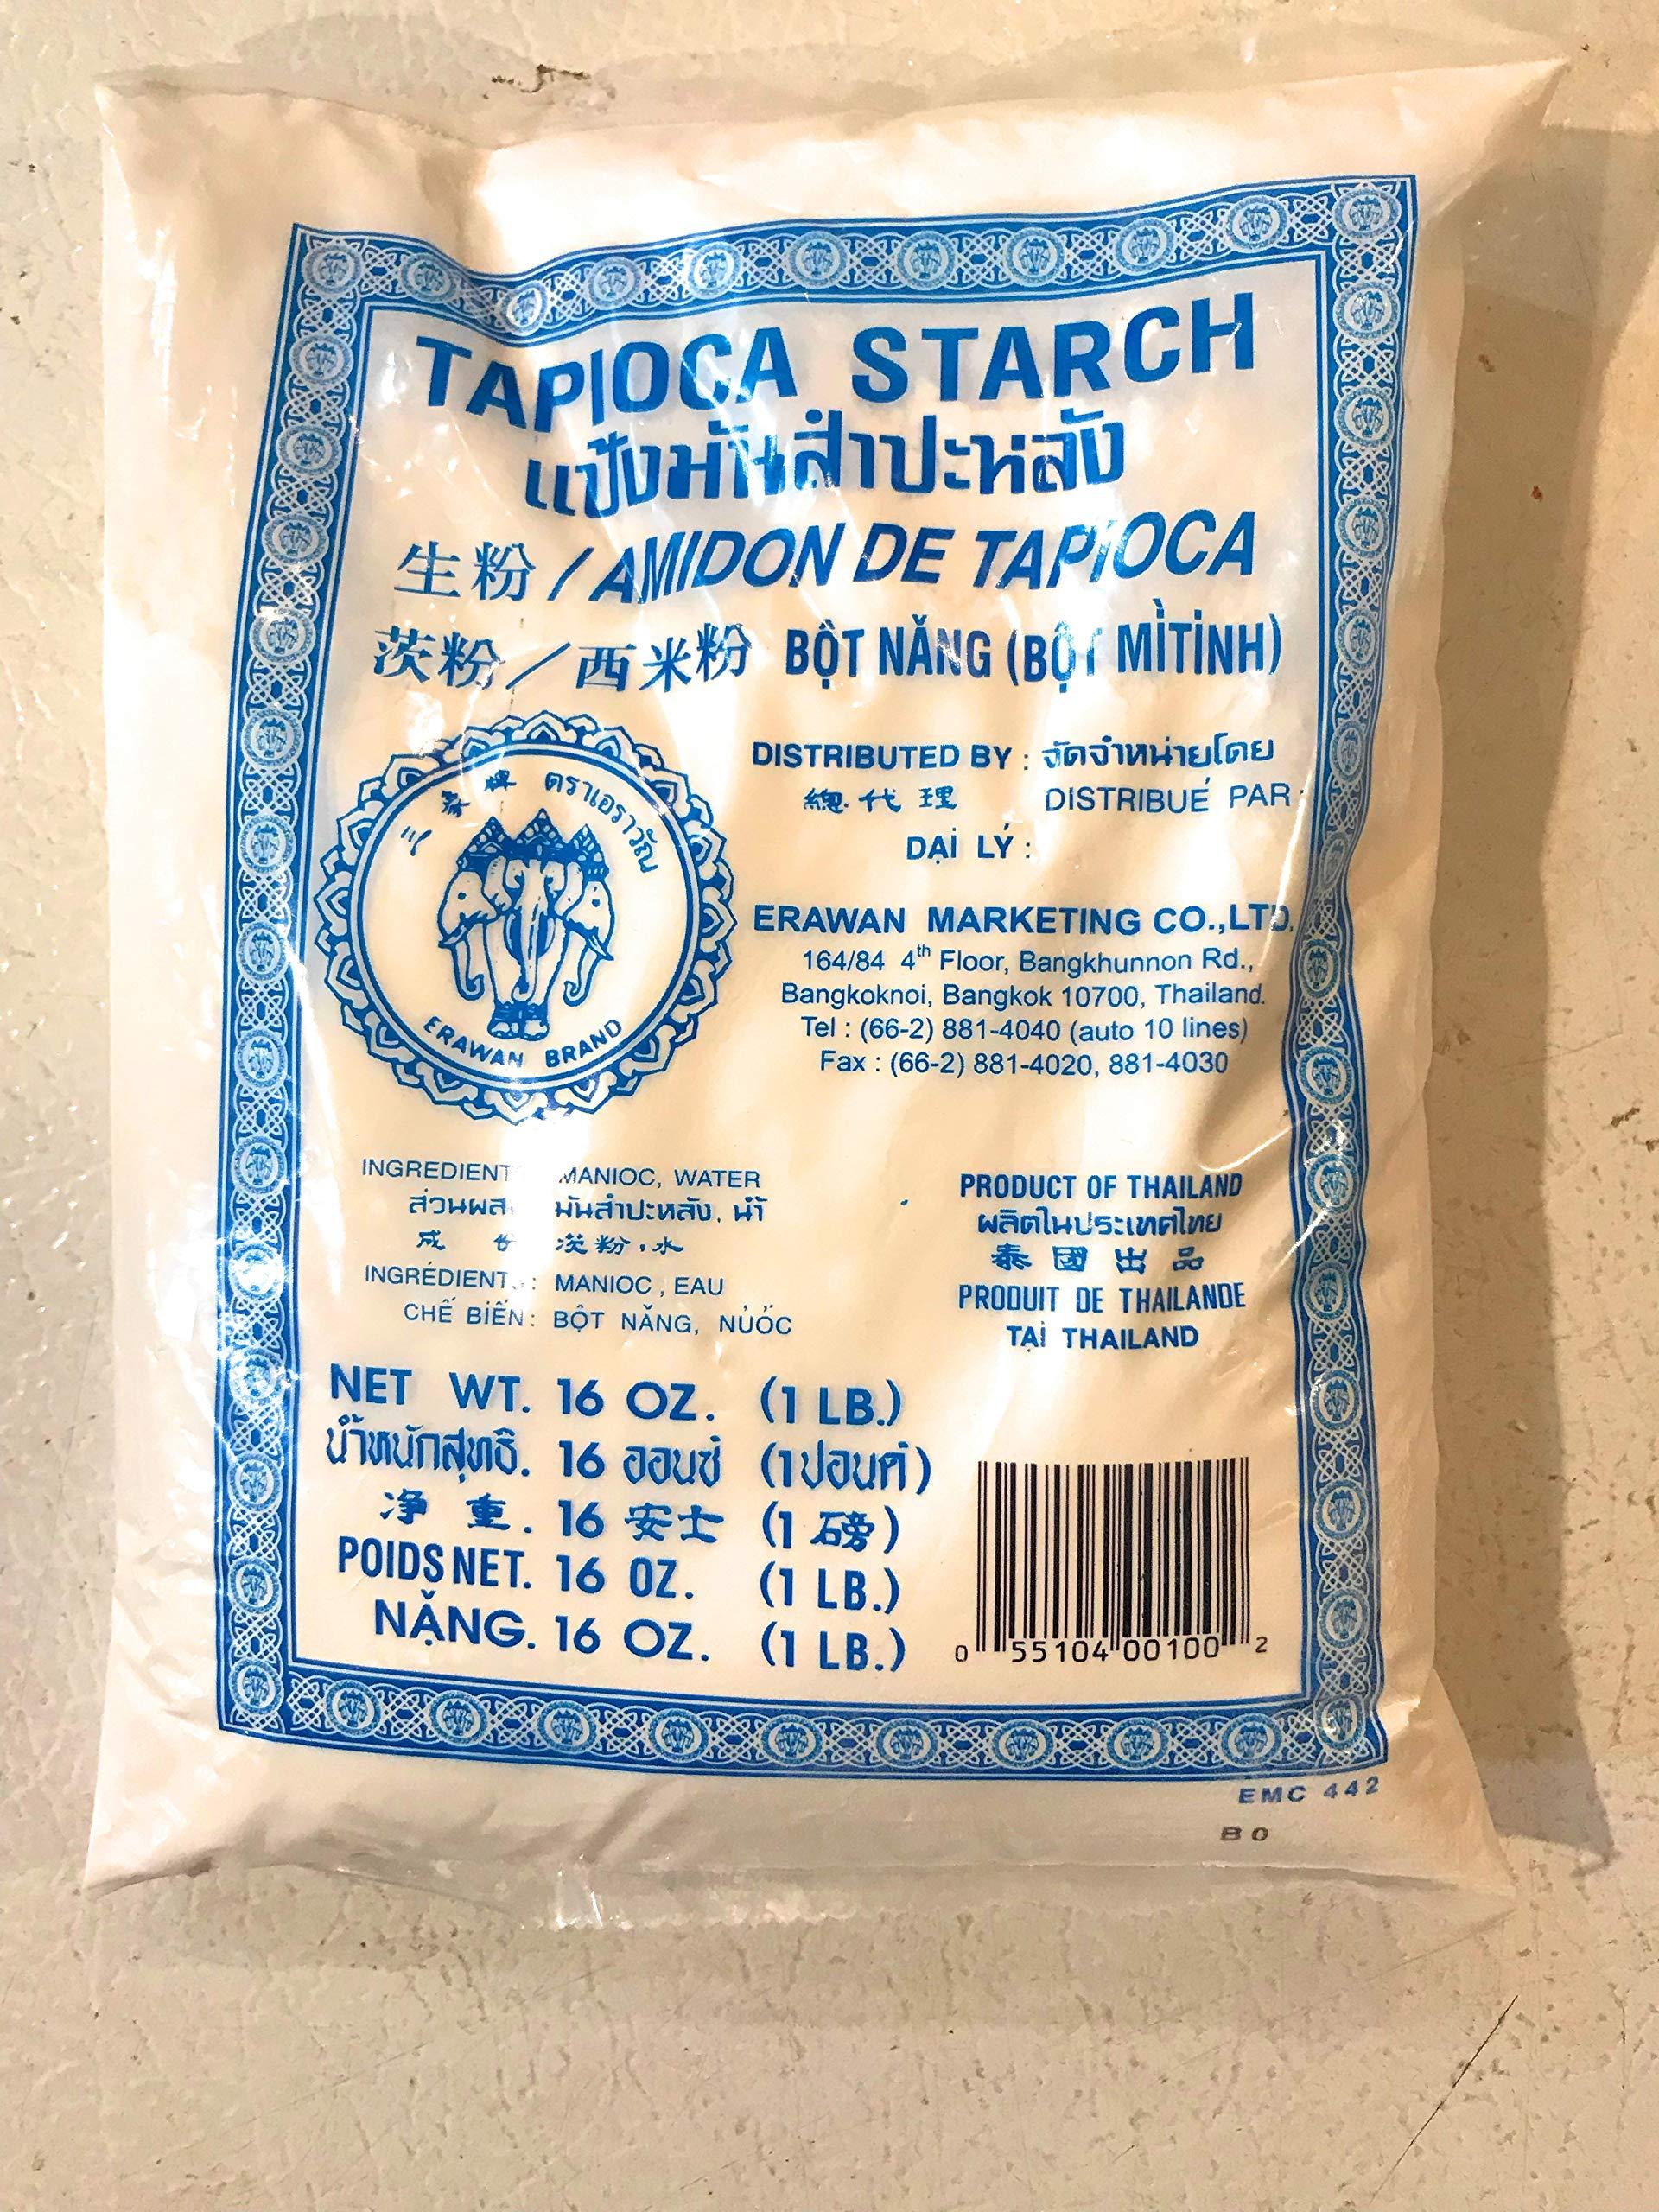 Tapioca Starch 1 LB x 20 Bags 西米粉